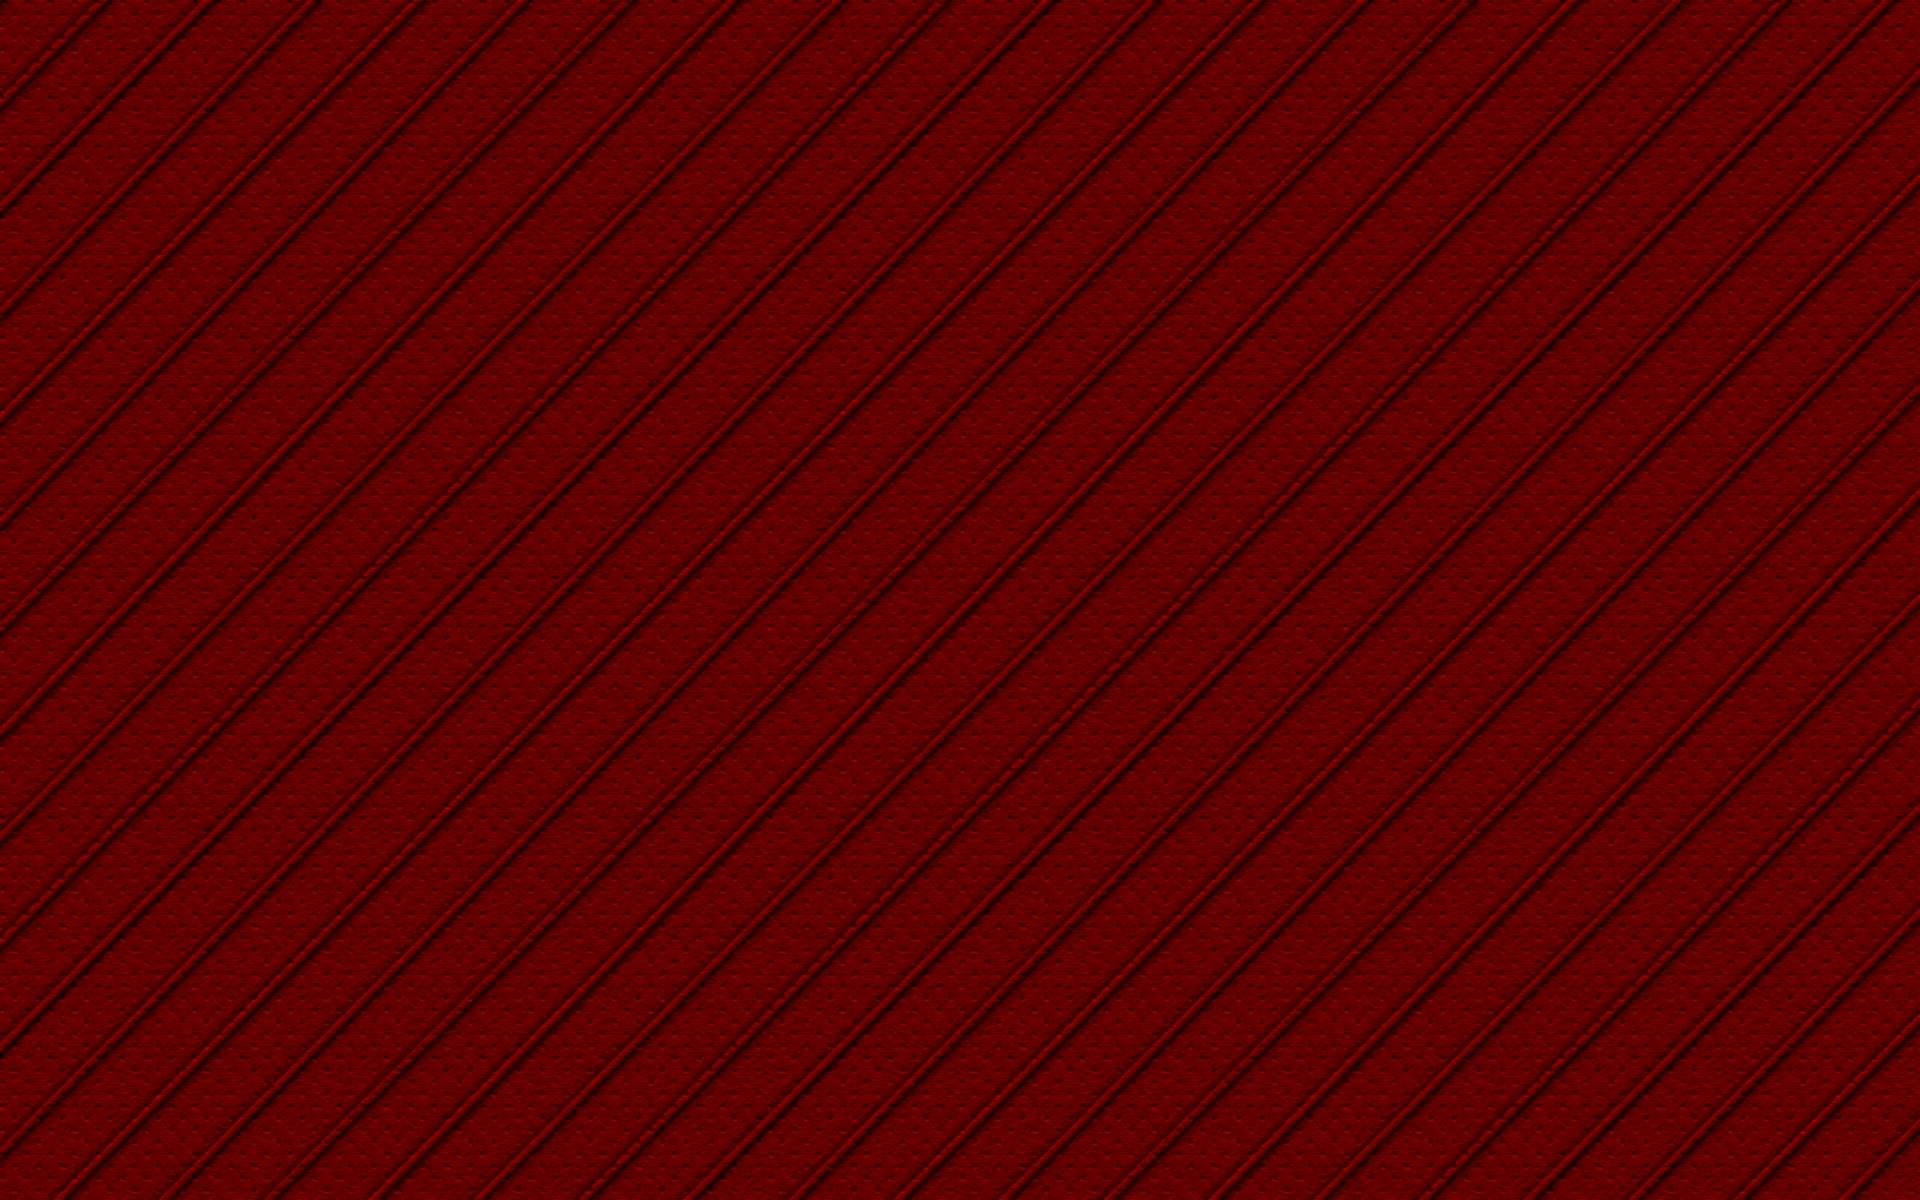 [Resim: lines_texture1101xfu7r.jpg]